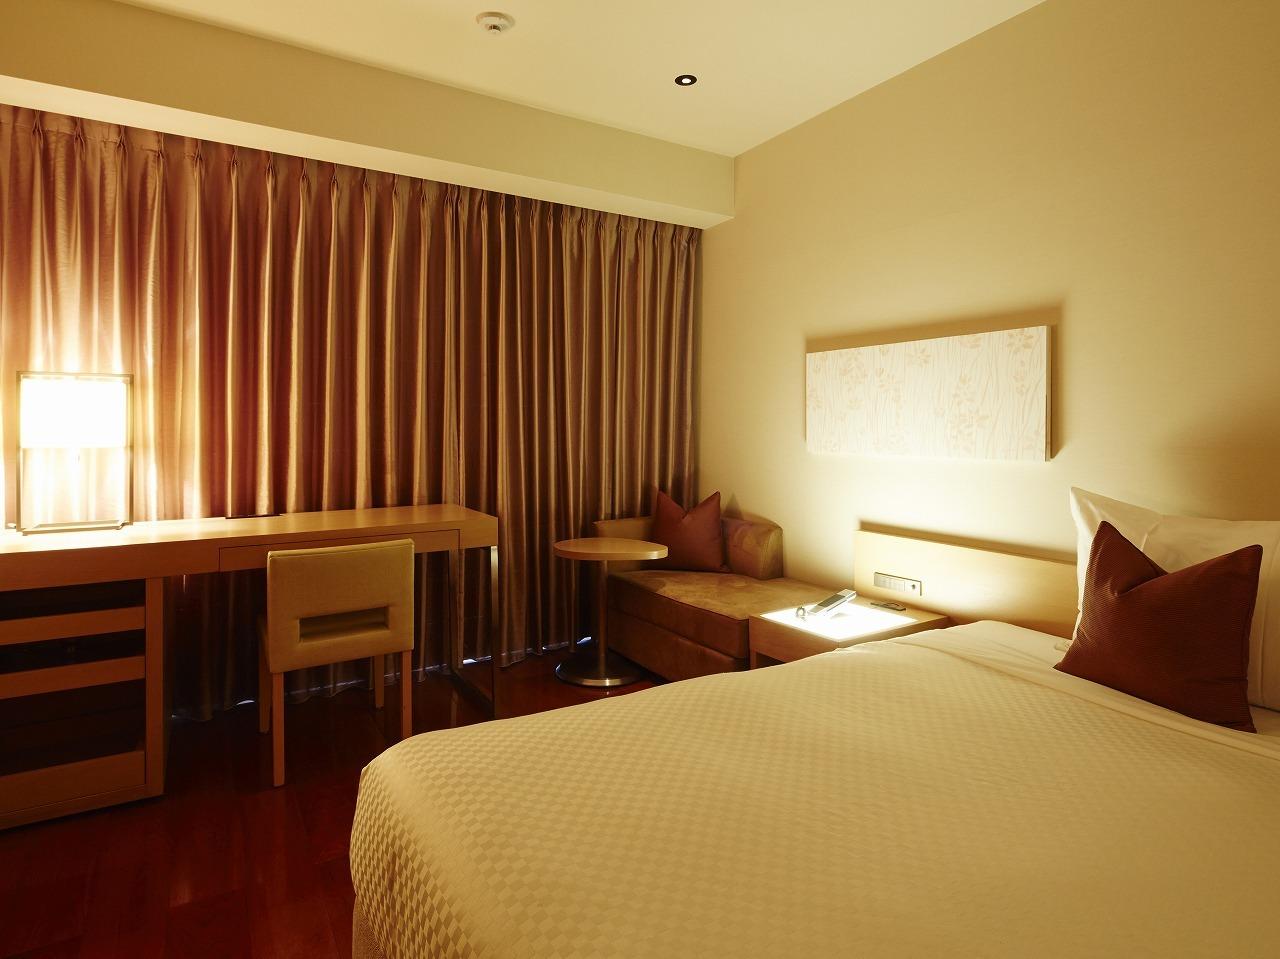 KOKO HOTEL 福岡天神 / KOKO Hotels スタンダードプラン / 素泊り